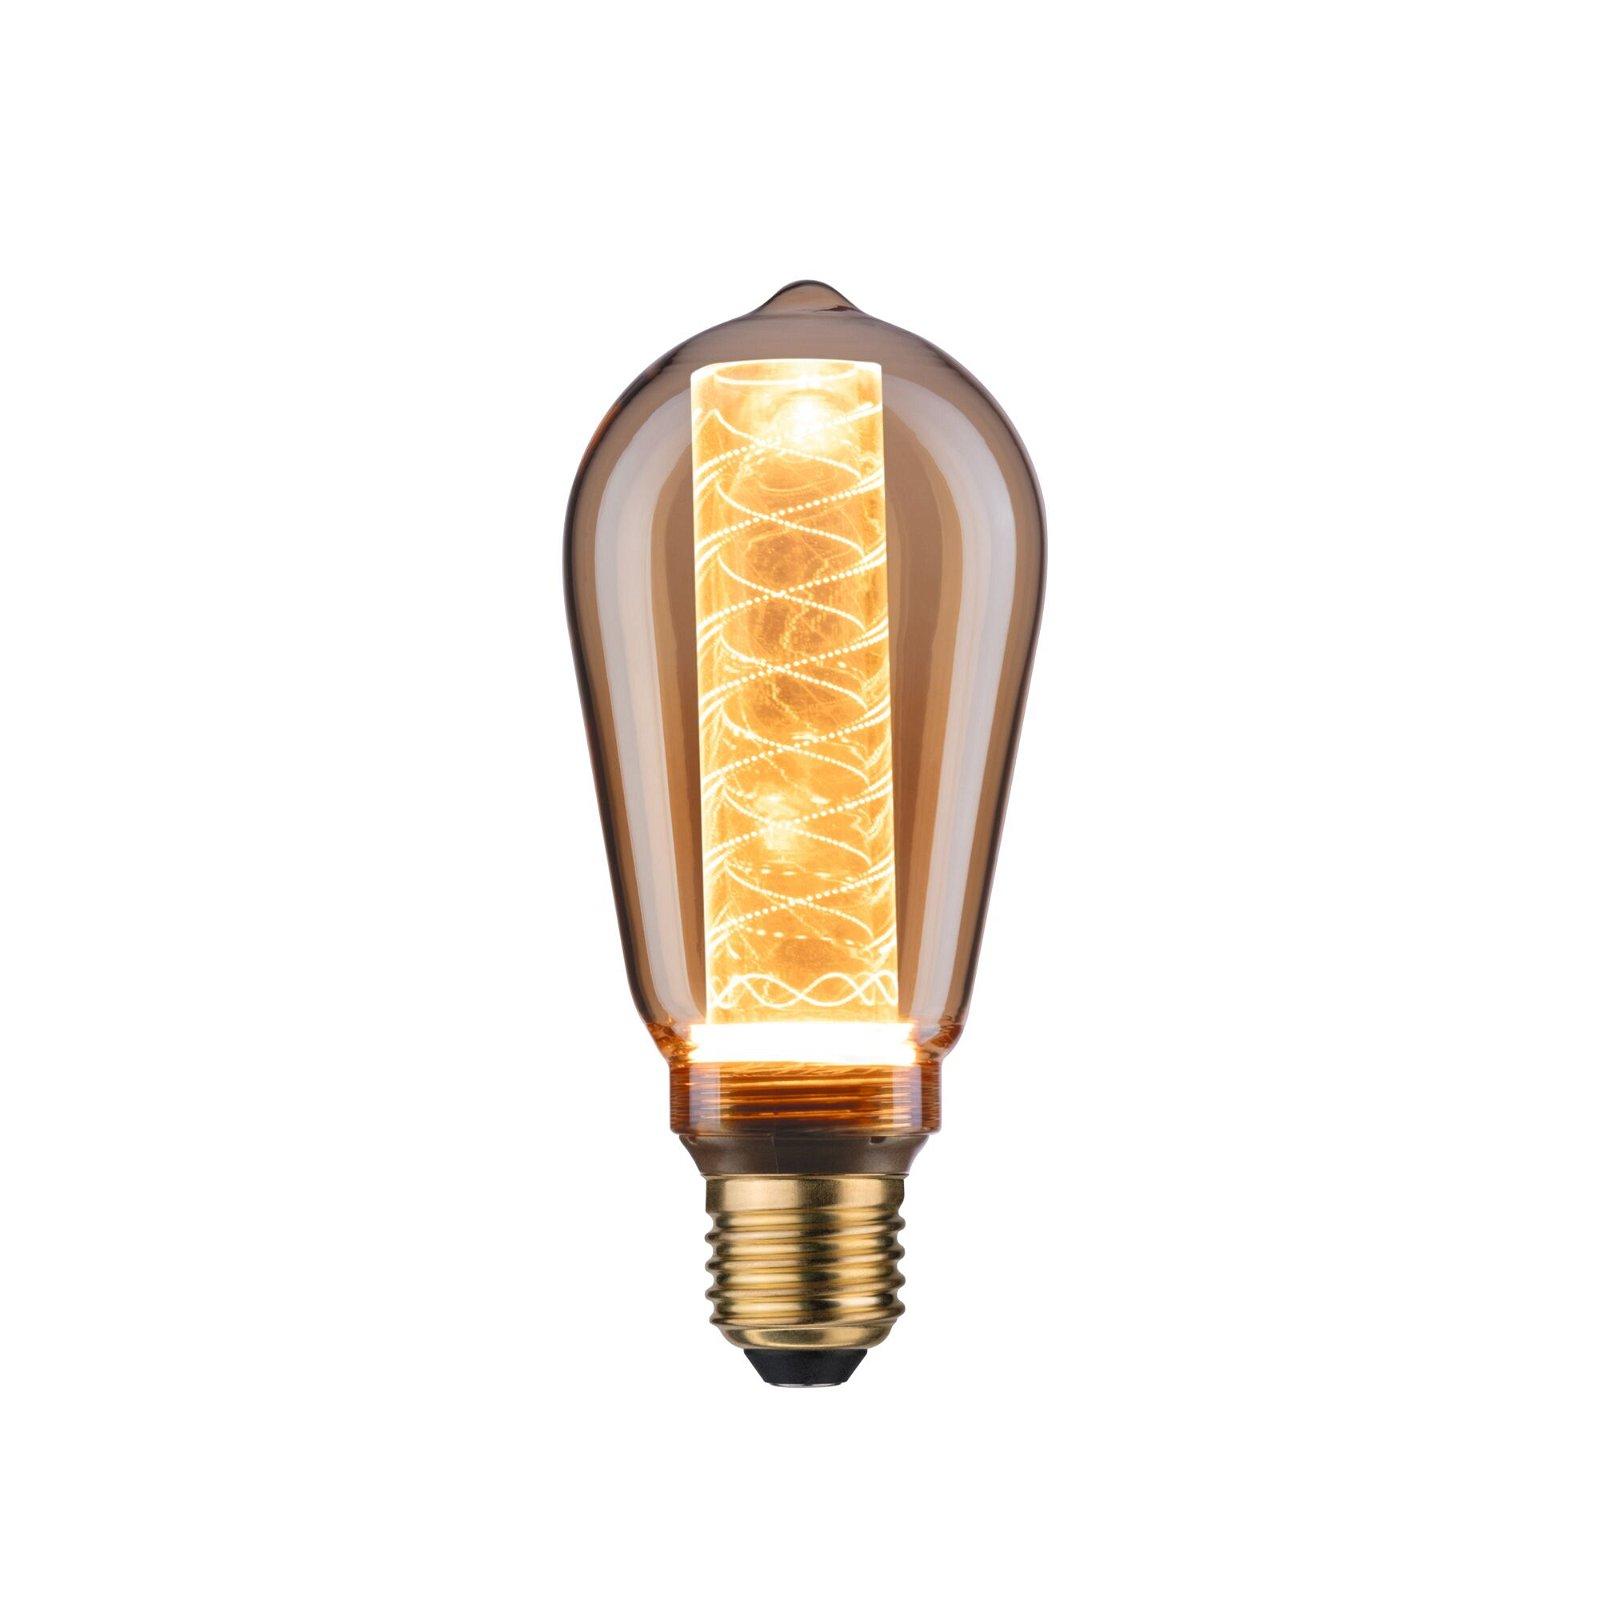 Inner Glow Edition LED Corn Internal corn spiral pattern E27 230V 200lm 4W 1800K Gold